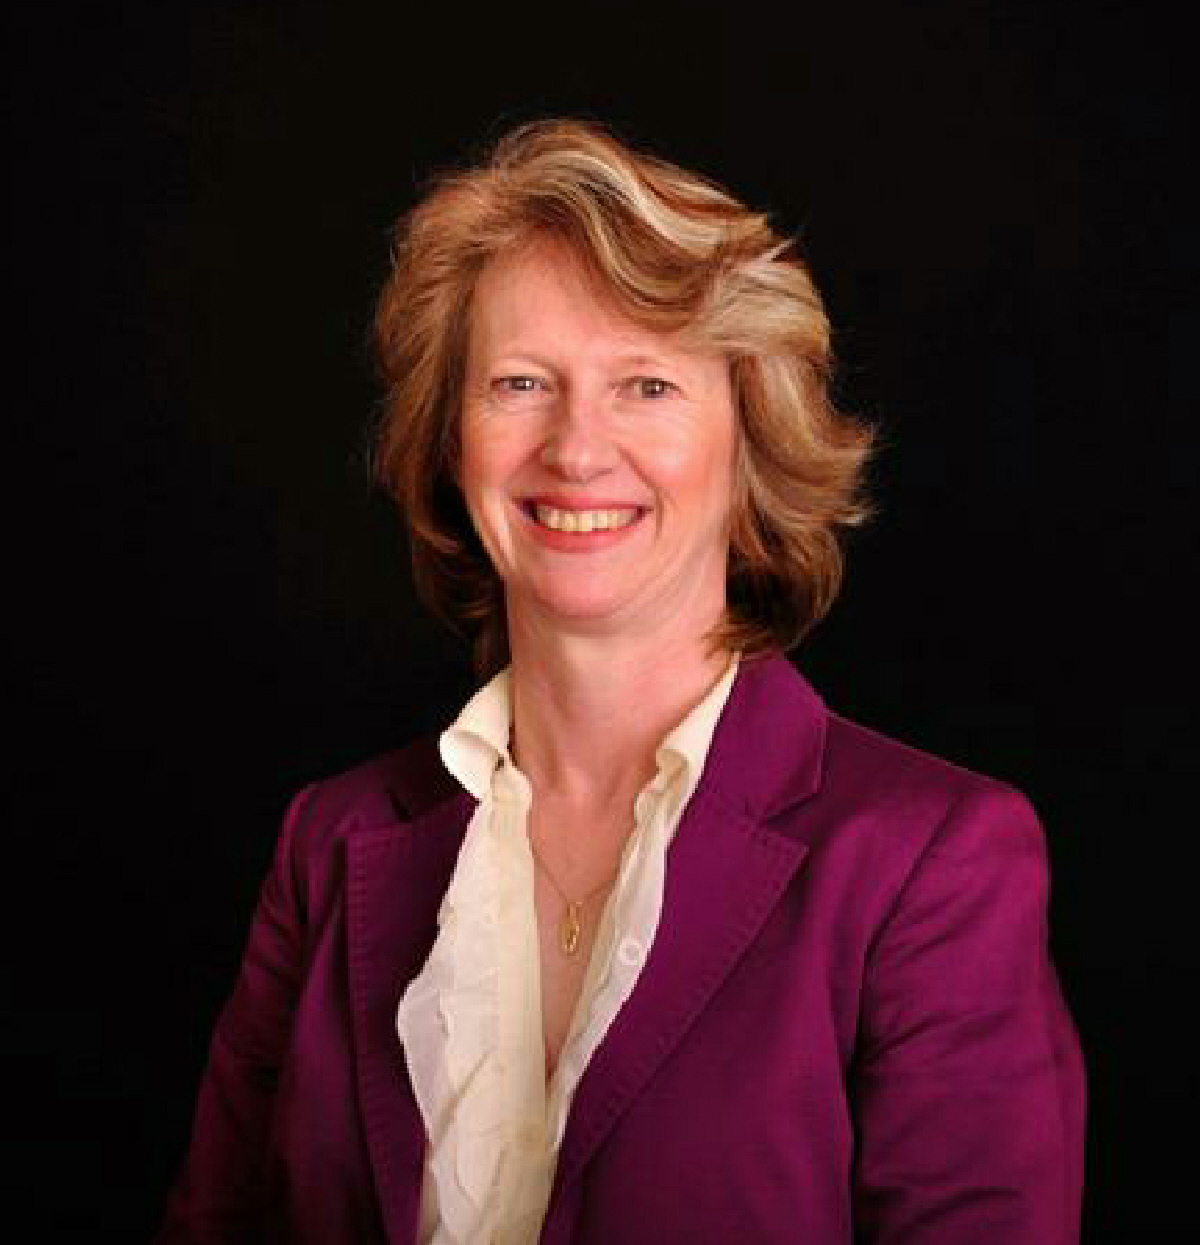 Karen Clark - Banchory and Mid Deeside